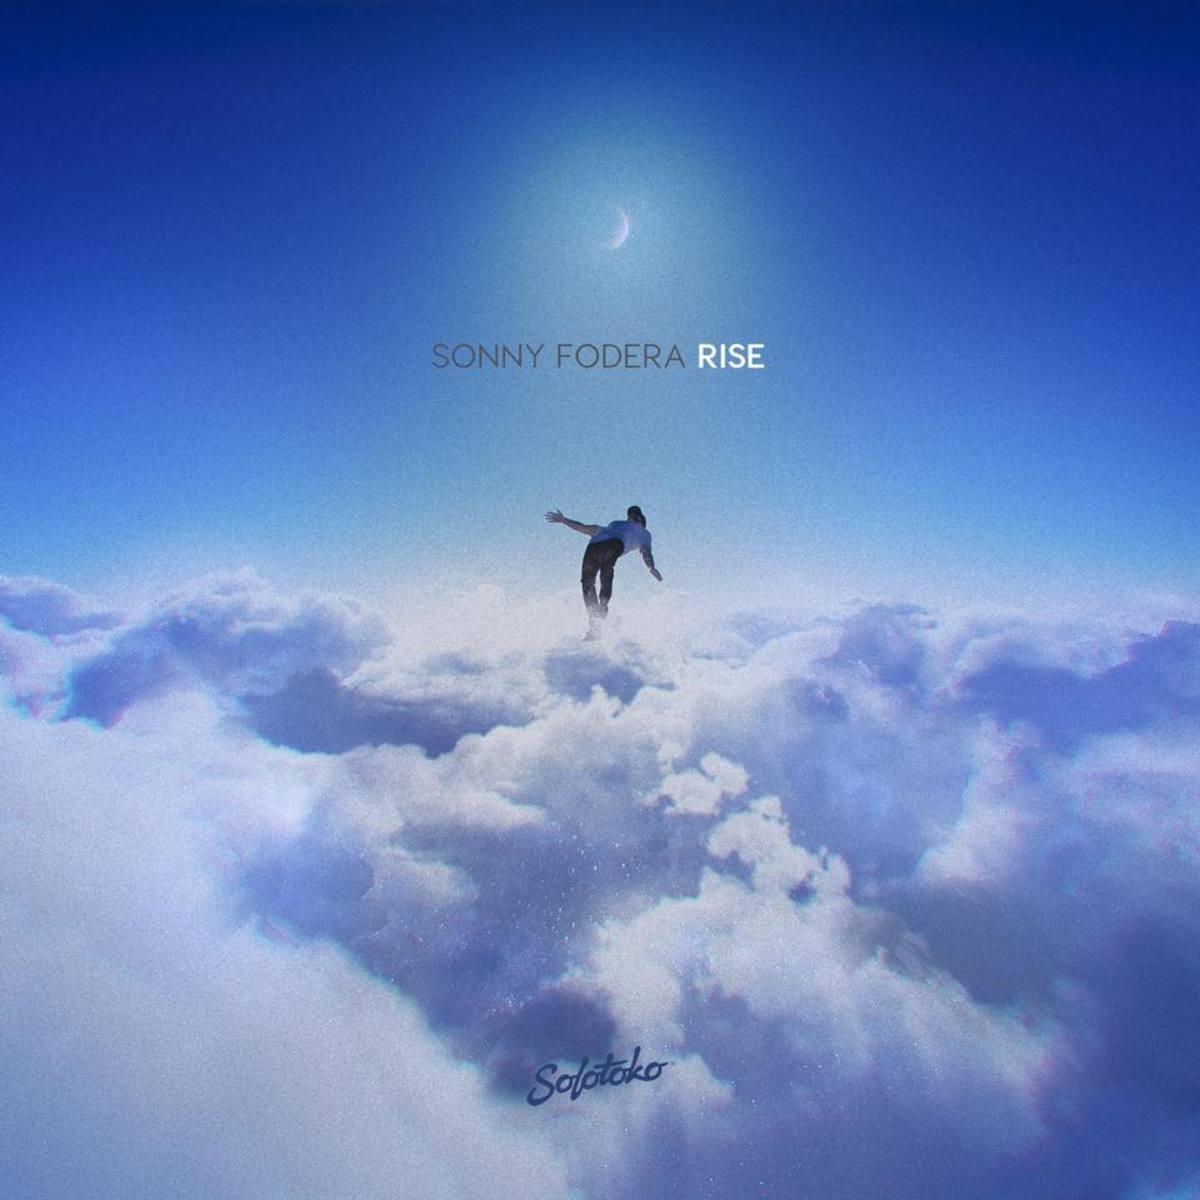 Sonny Fodera Rise Album Coverart